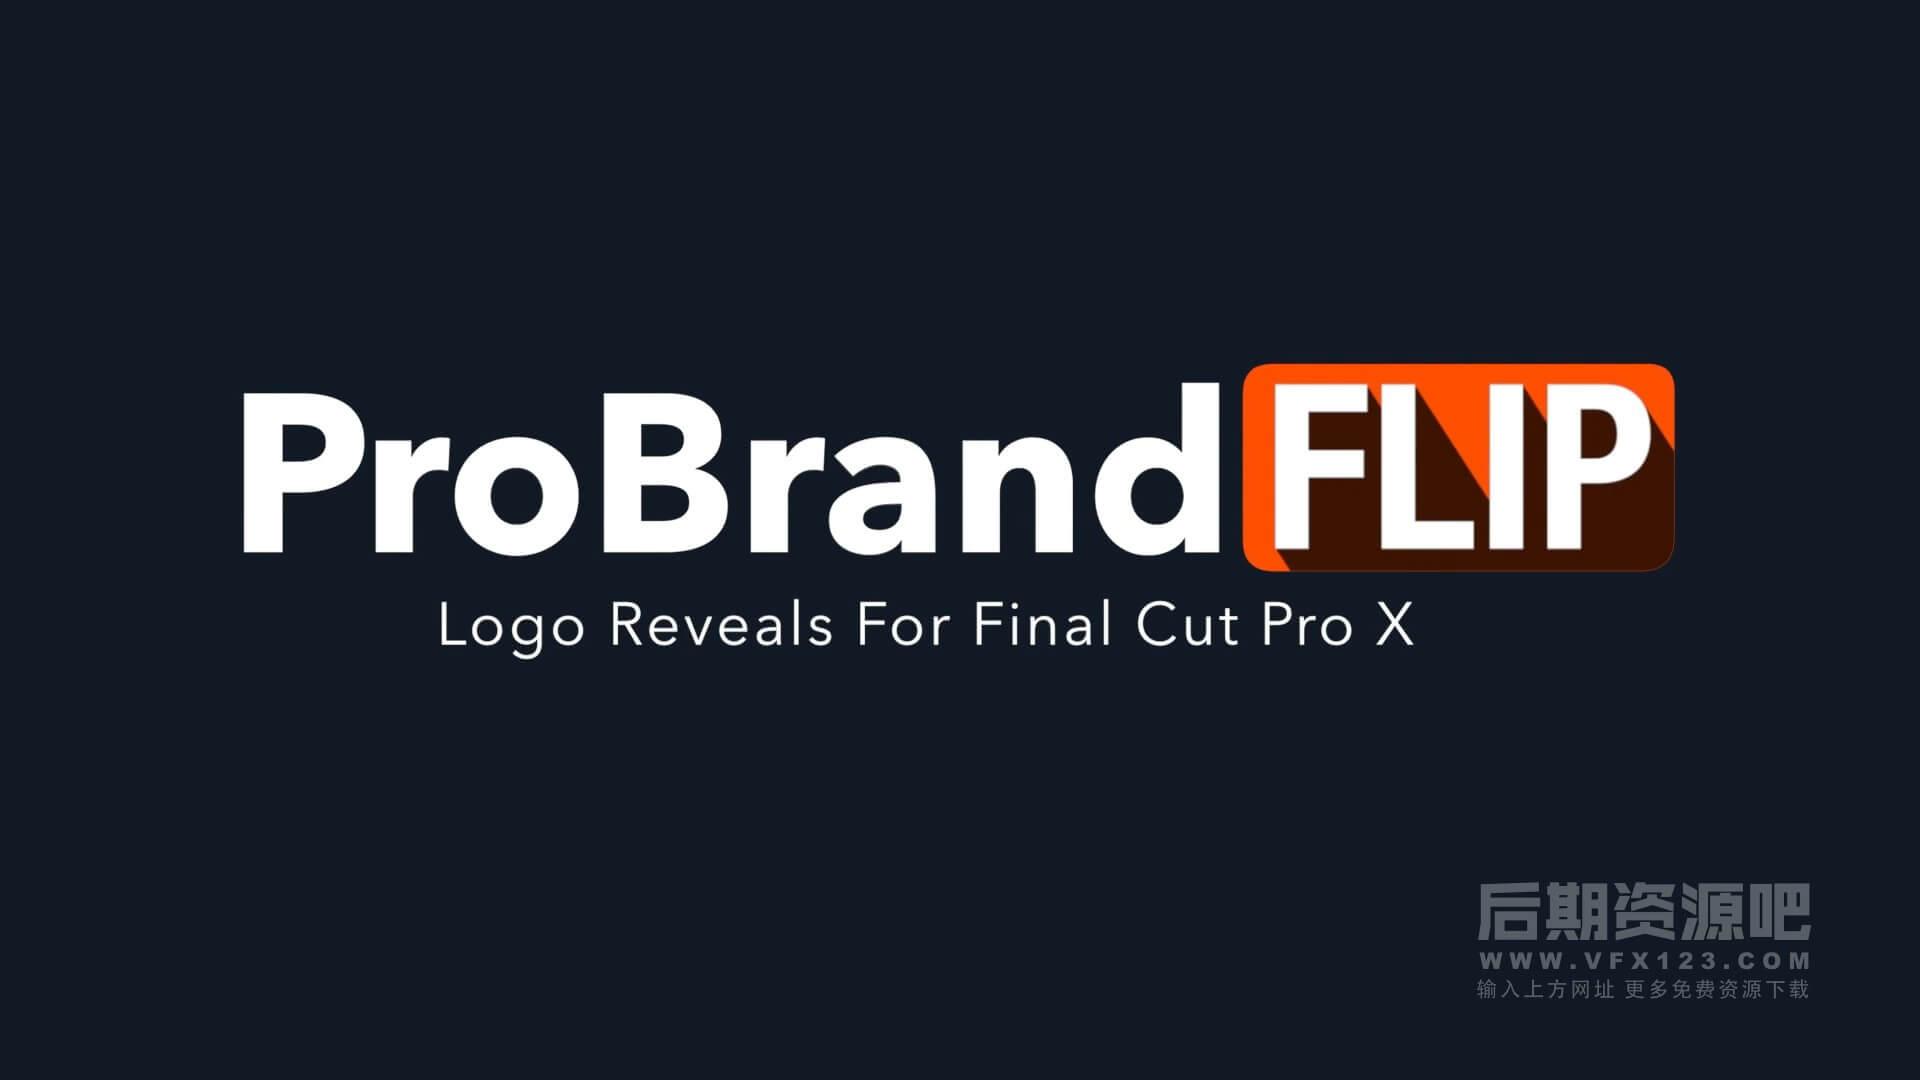 fcpx插件 30组专业创意翻转效果徽标LOGO展示动画模板 ProBrand Flip